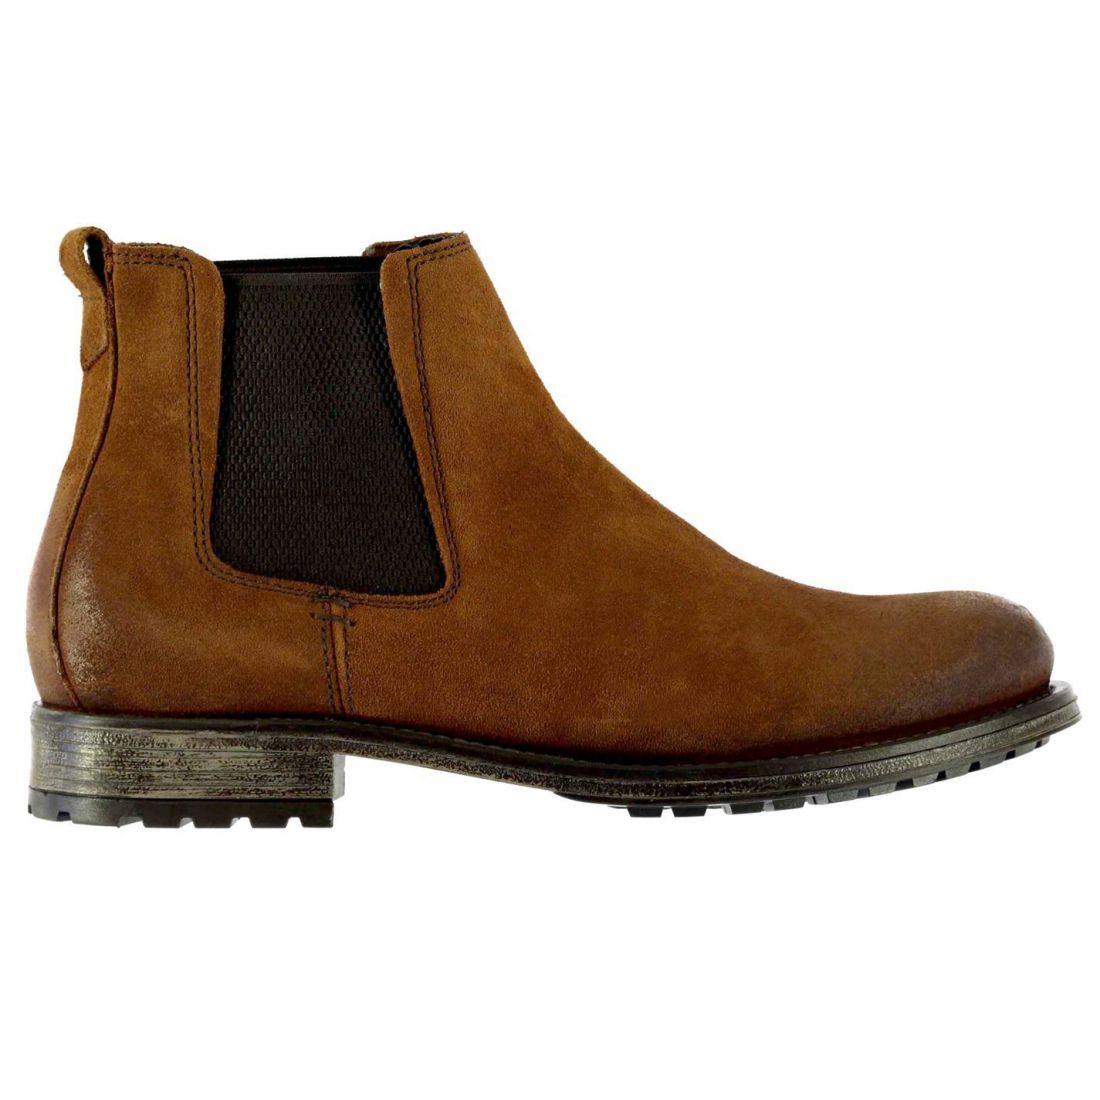 Firetrap Mens Gents Hex SD Chelsea Boots Shoes Footwear